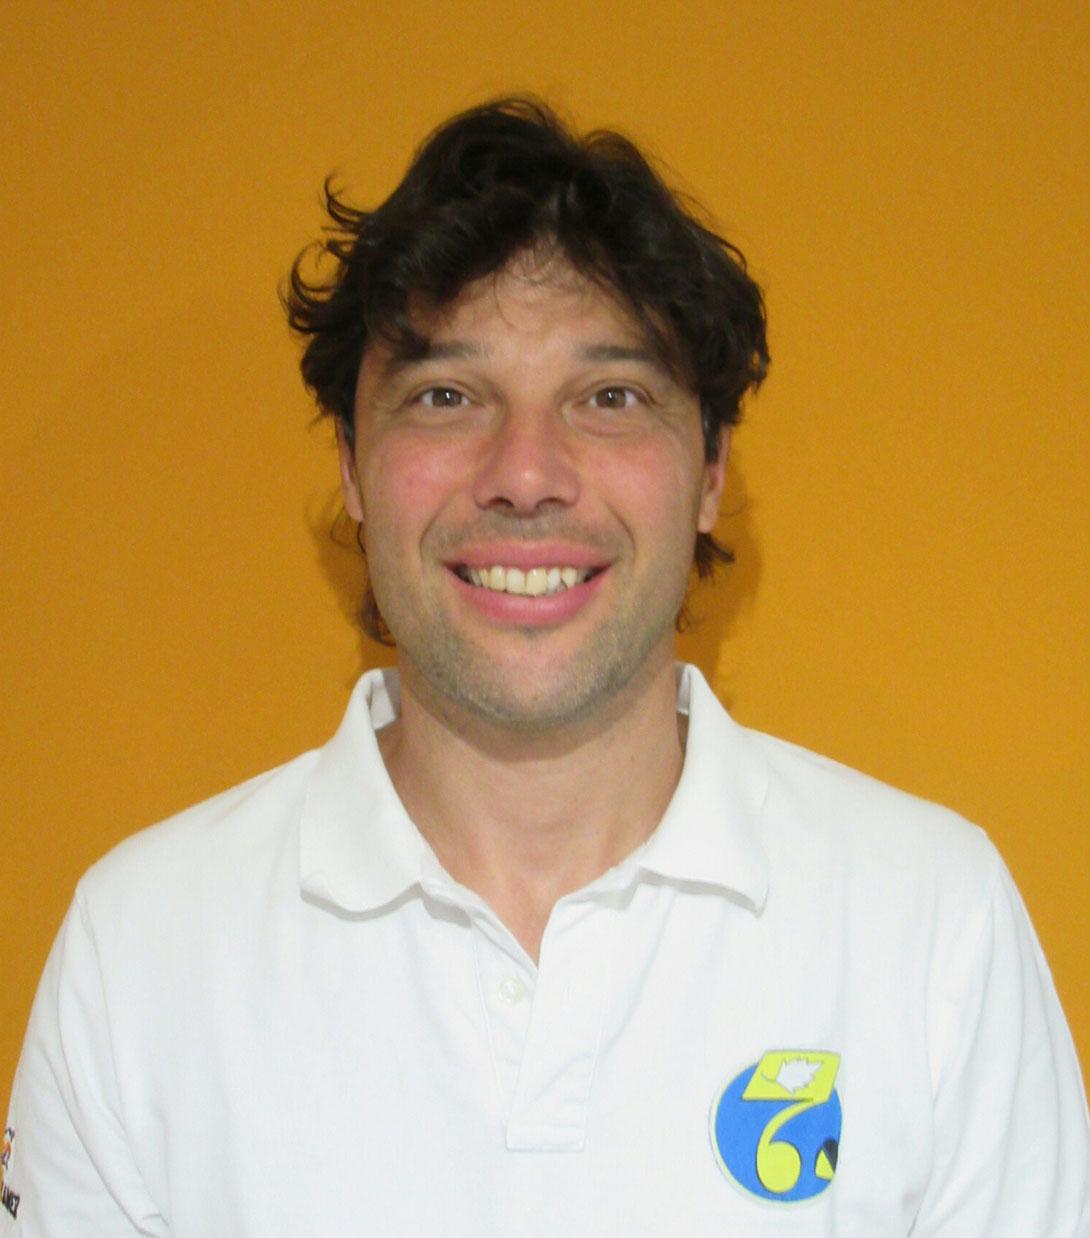 Rainer Helmuth